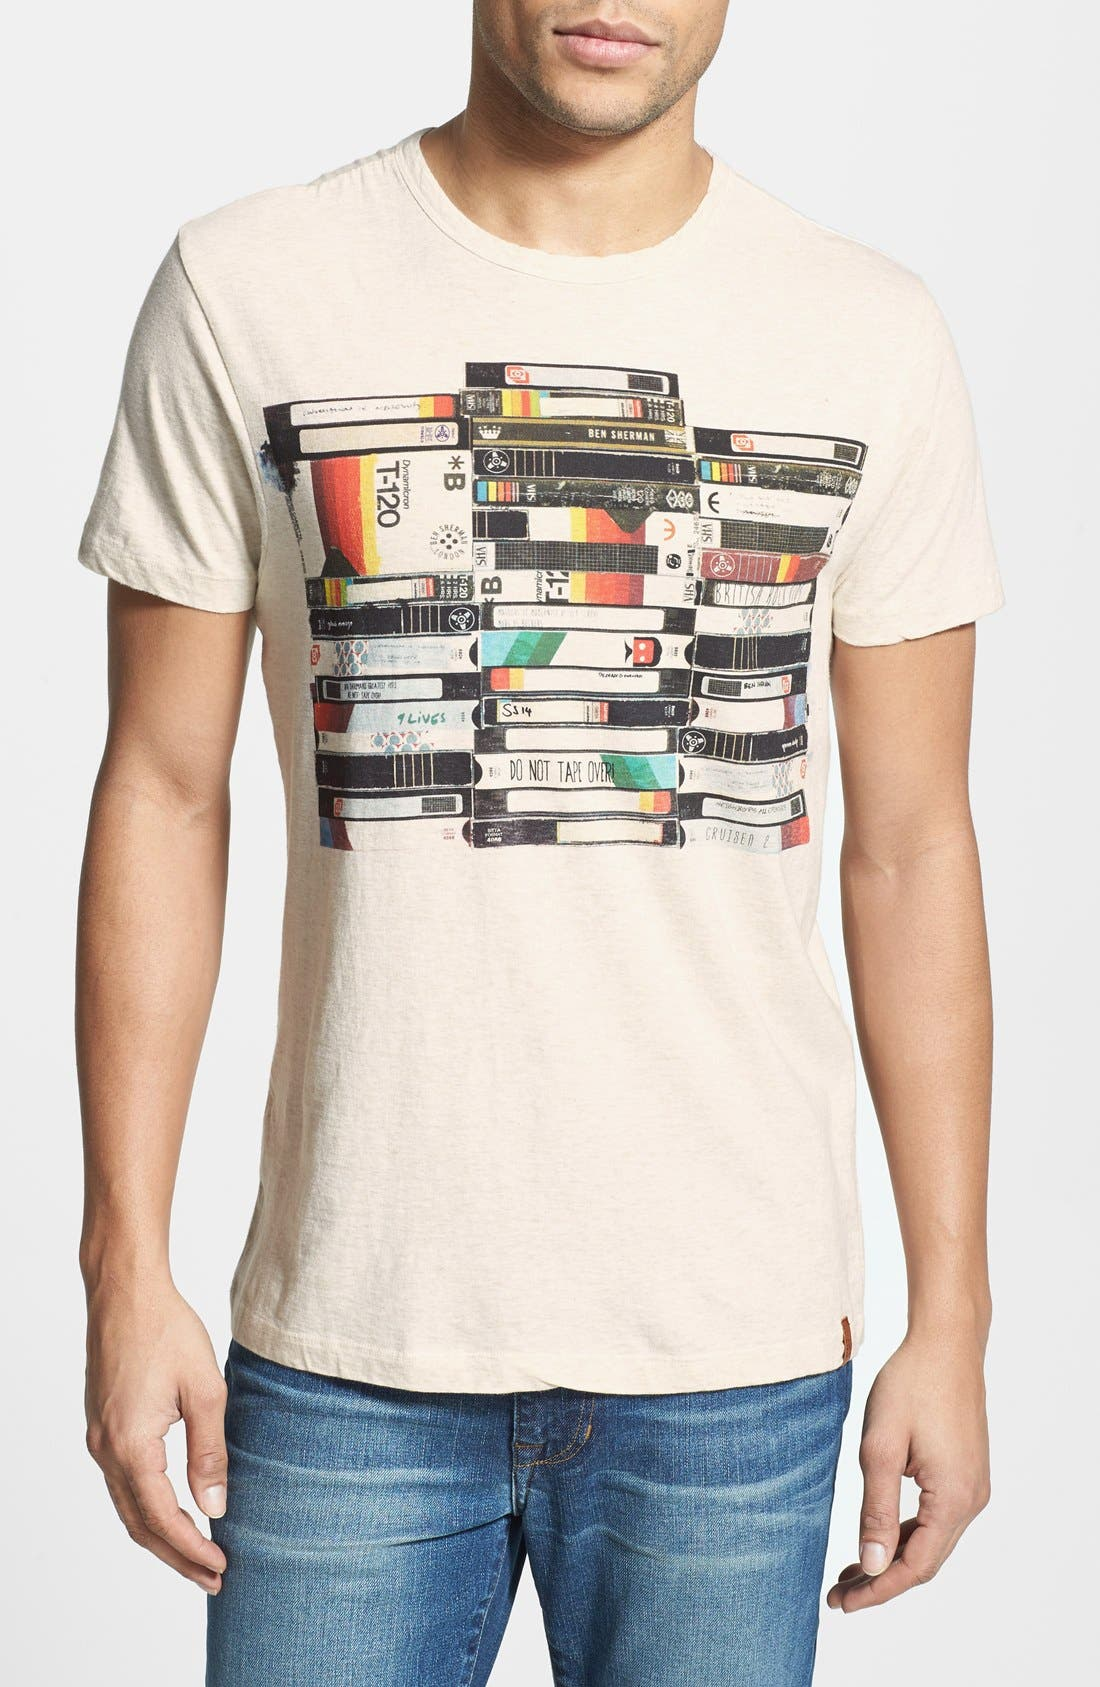 Alternate Image 1 Selected - Ben Sherman 'VHS' Graphic T-Shirt